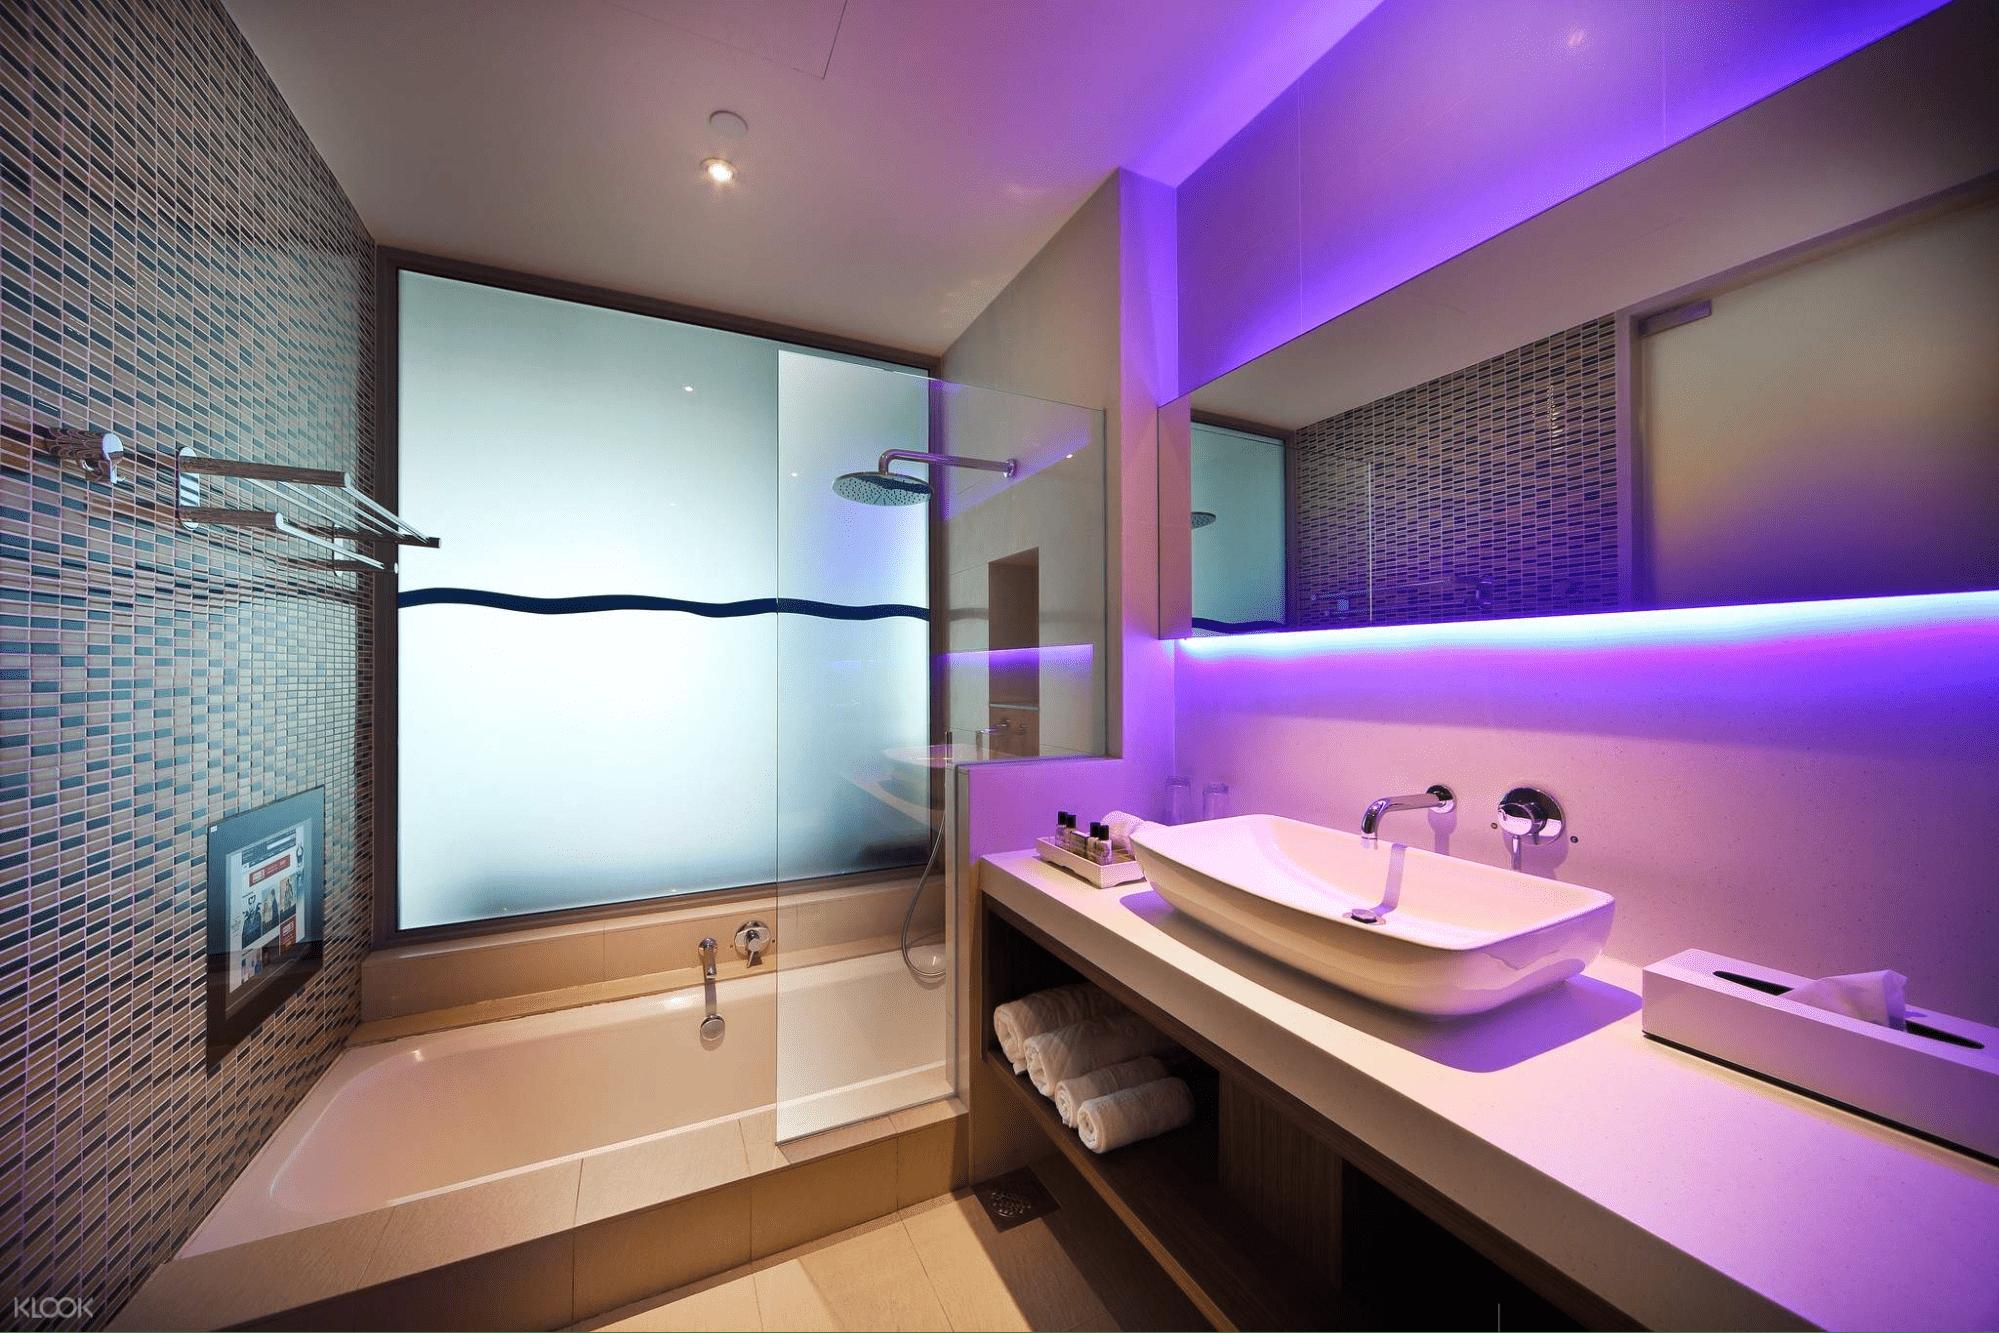 ONE°15 Marina Sentosa Cove - bathroom with tub and TV